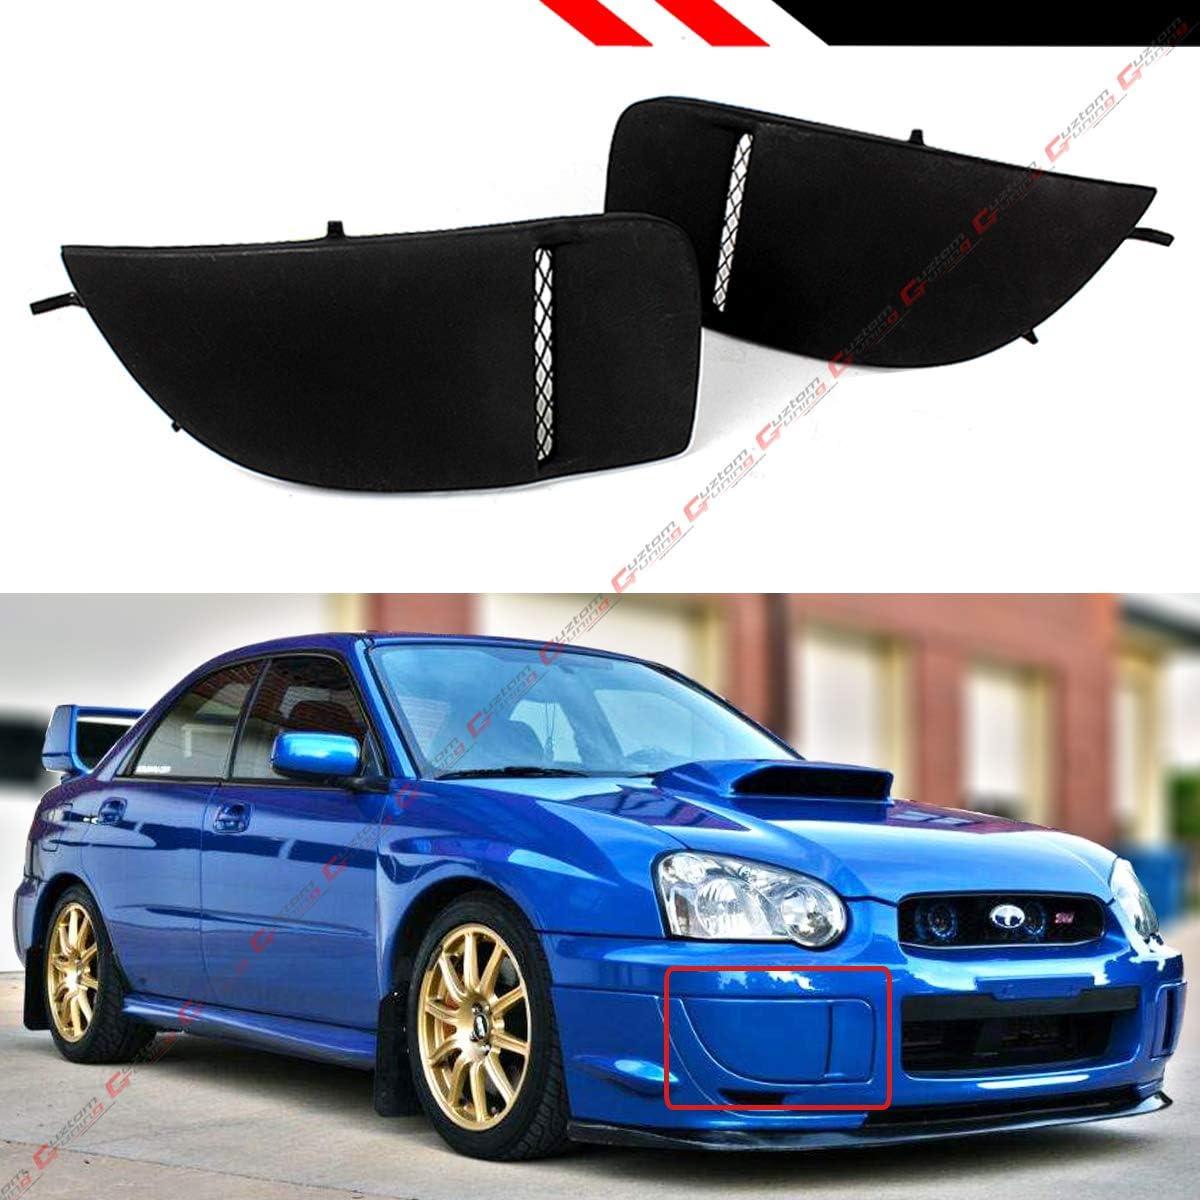 For 2004-2005 Subaru Impreza WRX STi Blue Fog Light Lamp Bumper Bezel Cover Cap